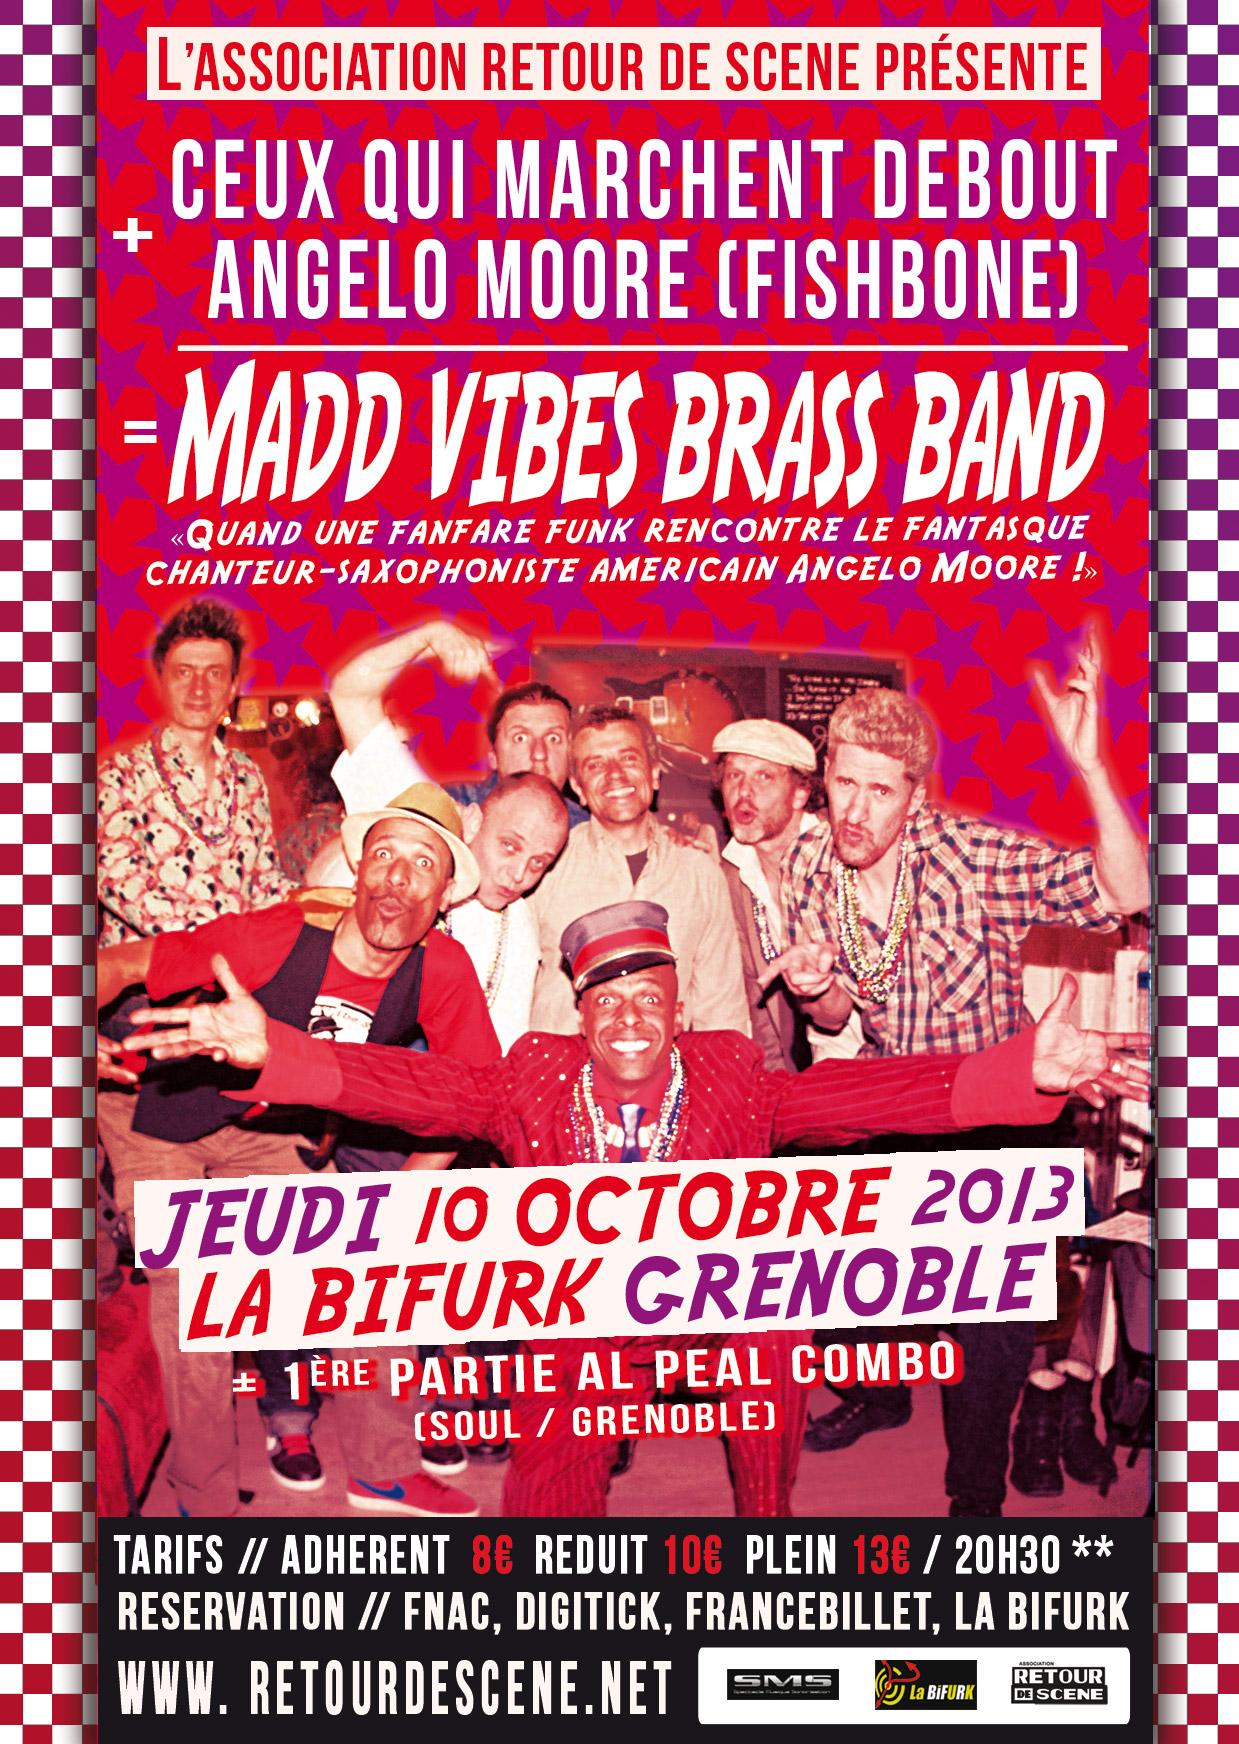 Madd Vibes Brass Band - La Bifurk - 10/10/2013